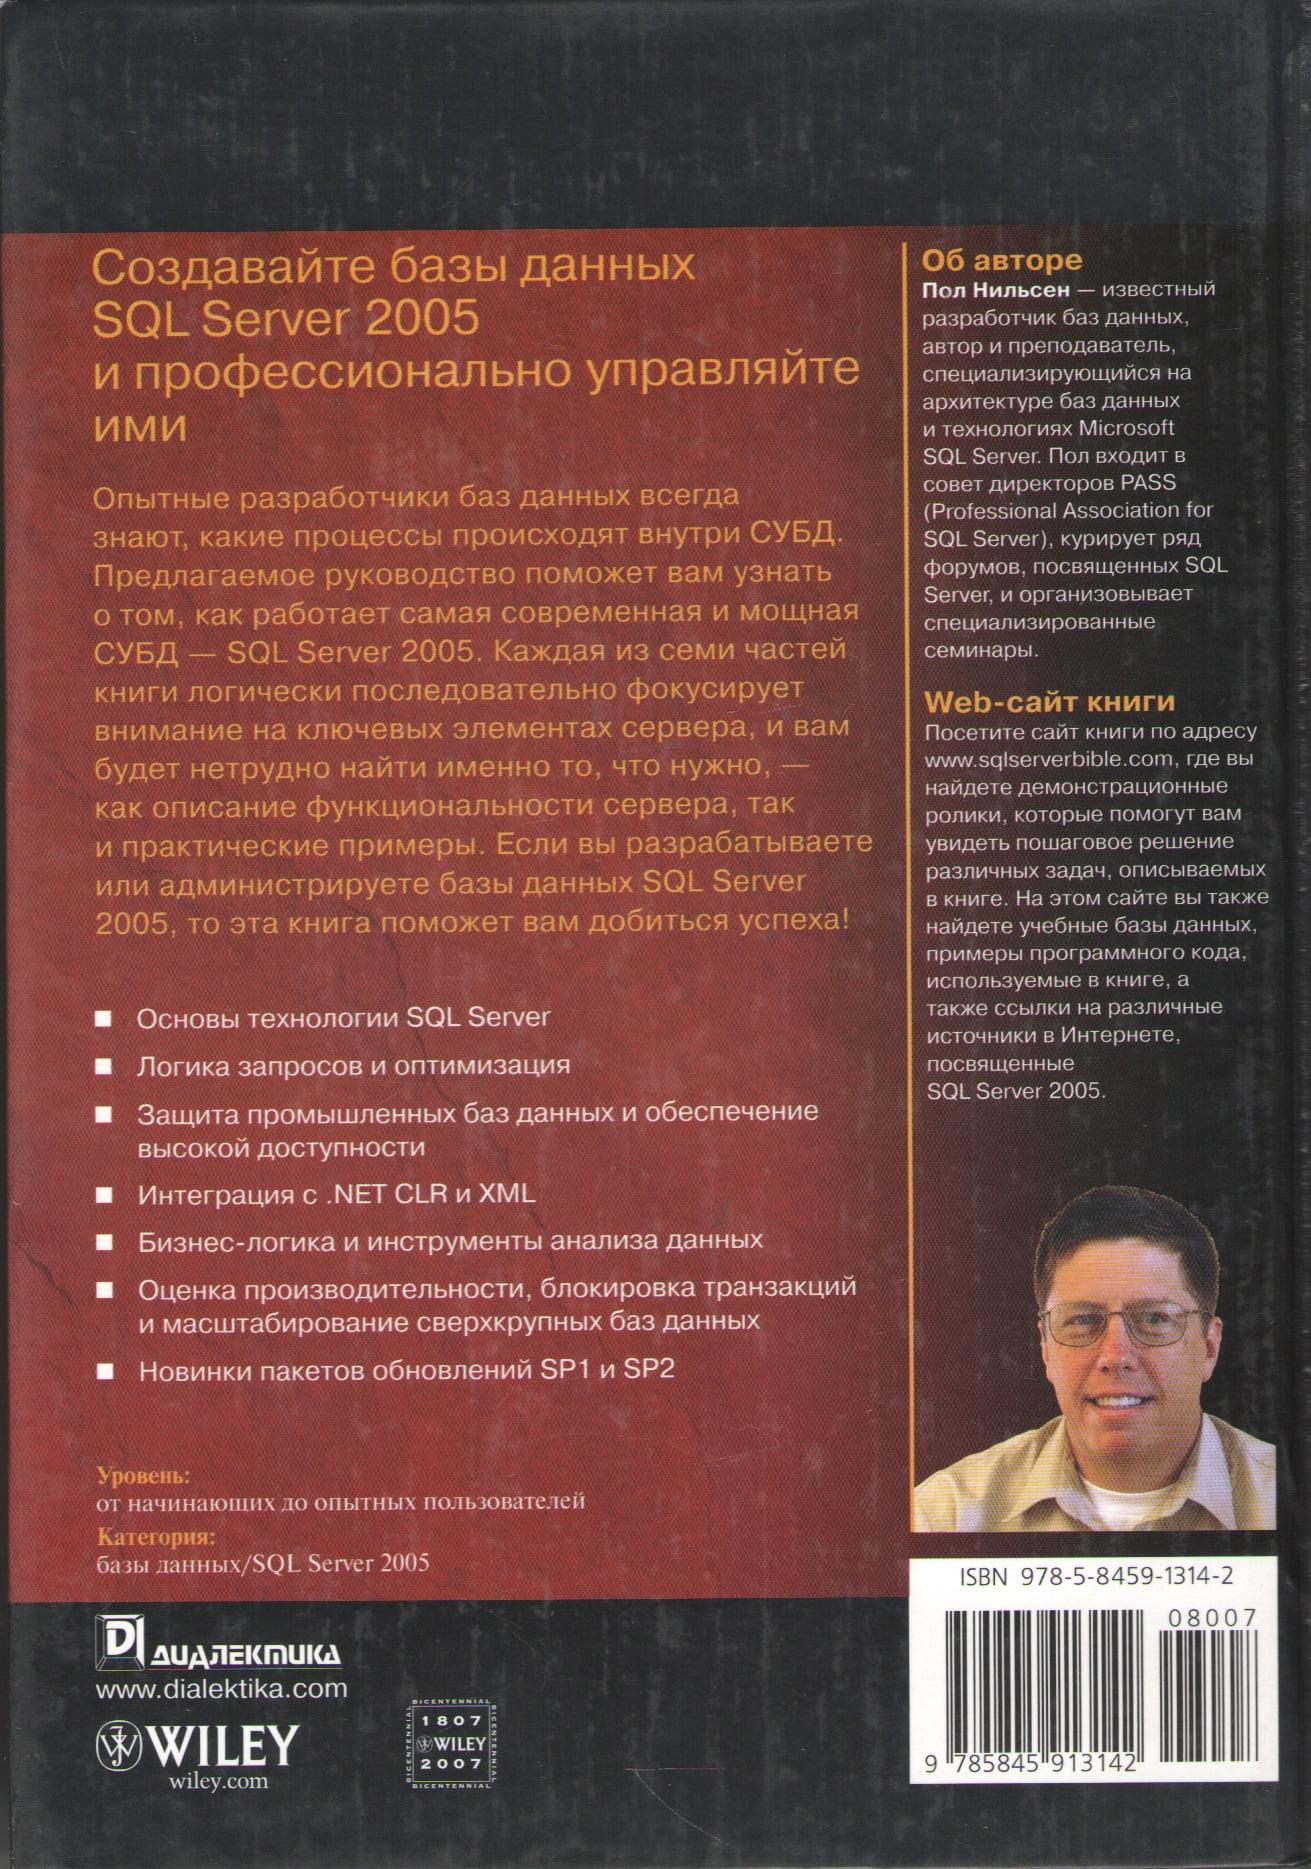 Microsoft+SQL+Server+2005.+%D0%91%D1%96%D0%B1%D0%BB%D1%96%D1%8F+%D0%BA%D0%BE%D1%80%D0%B8%D1%81%D1%82%D1%83%D0%B2%D0%B0%D1%87%D0%B0 - фото 2